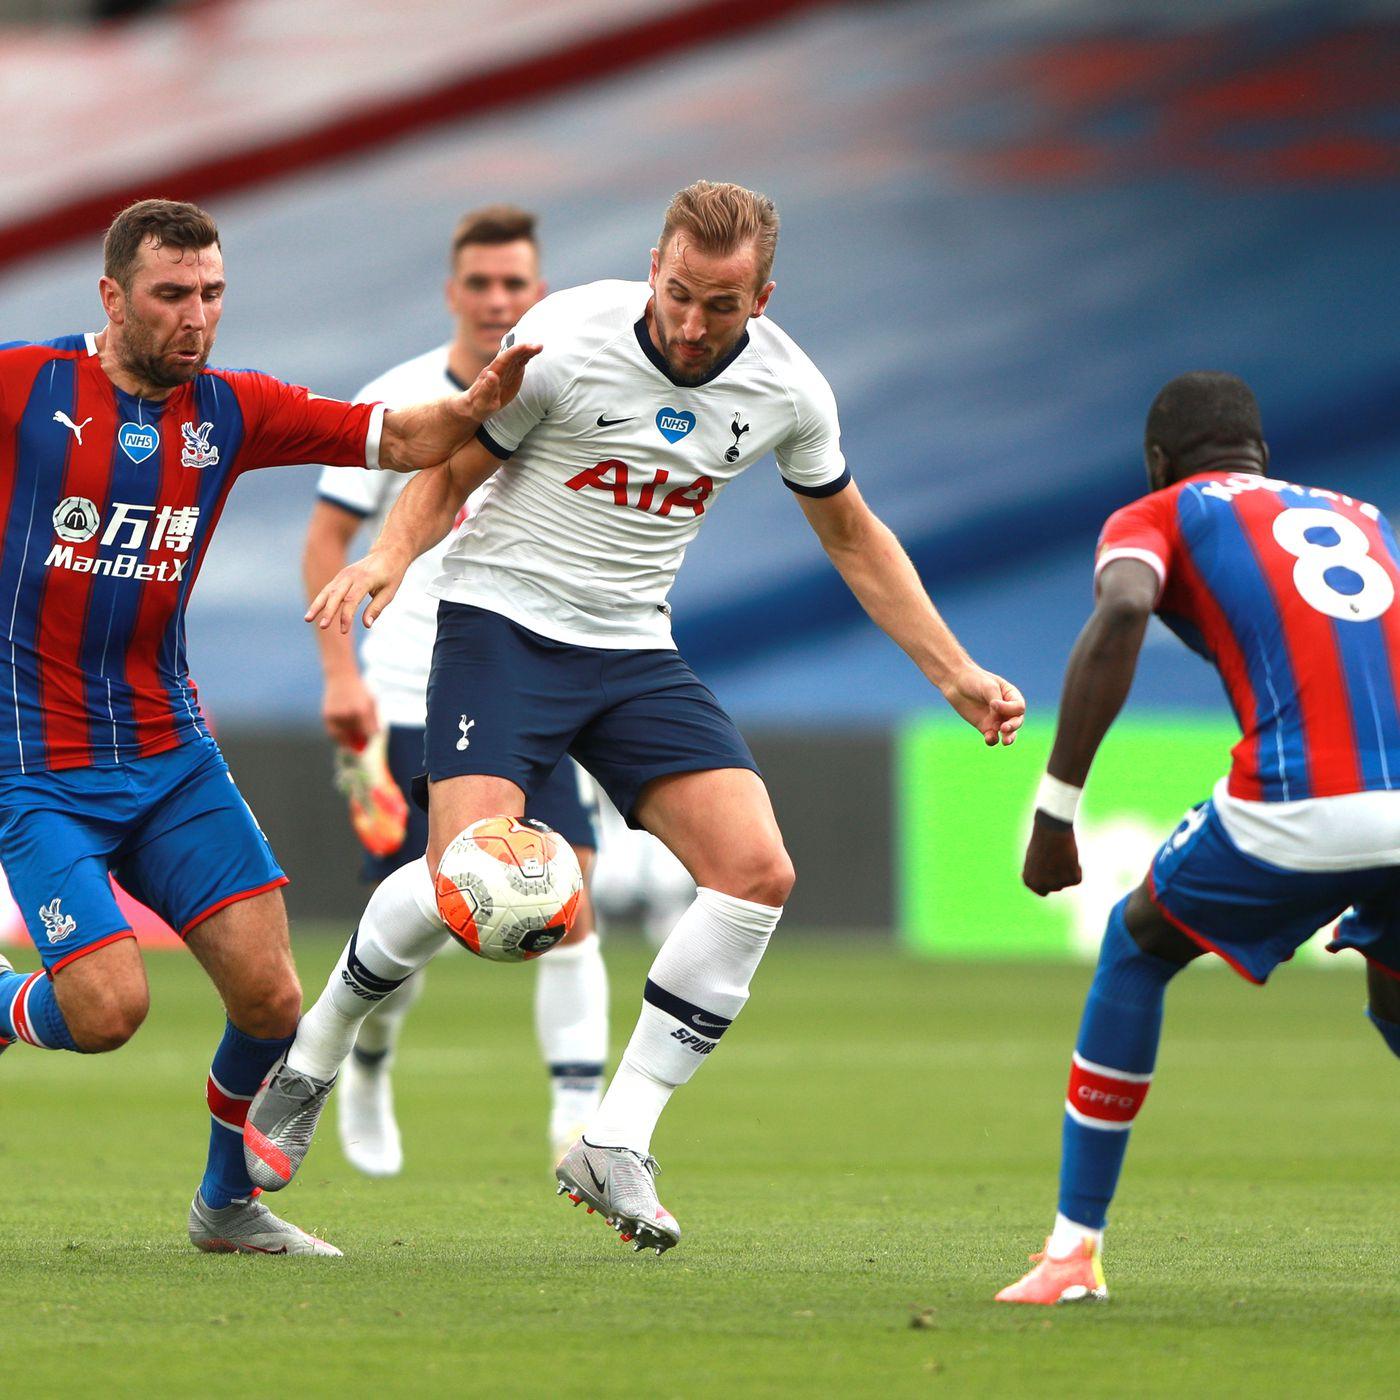 Crystal Palace Vs Tottenham Hotspur Premier League Match Time Tv Channels How To Watch Cartilage Free Captain